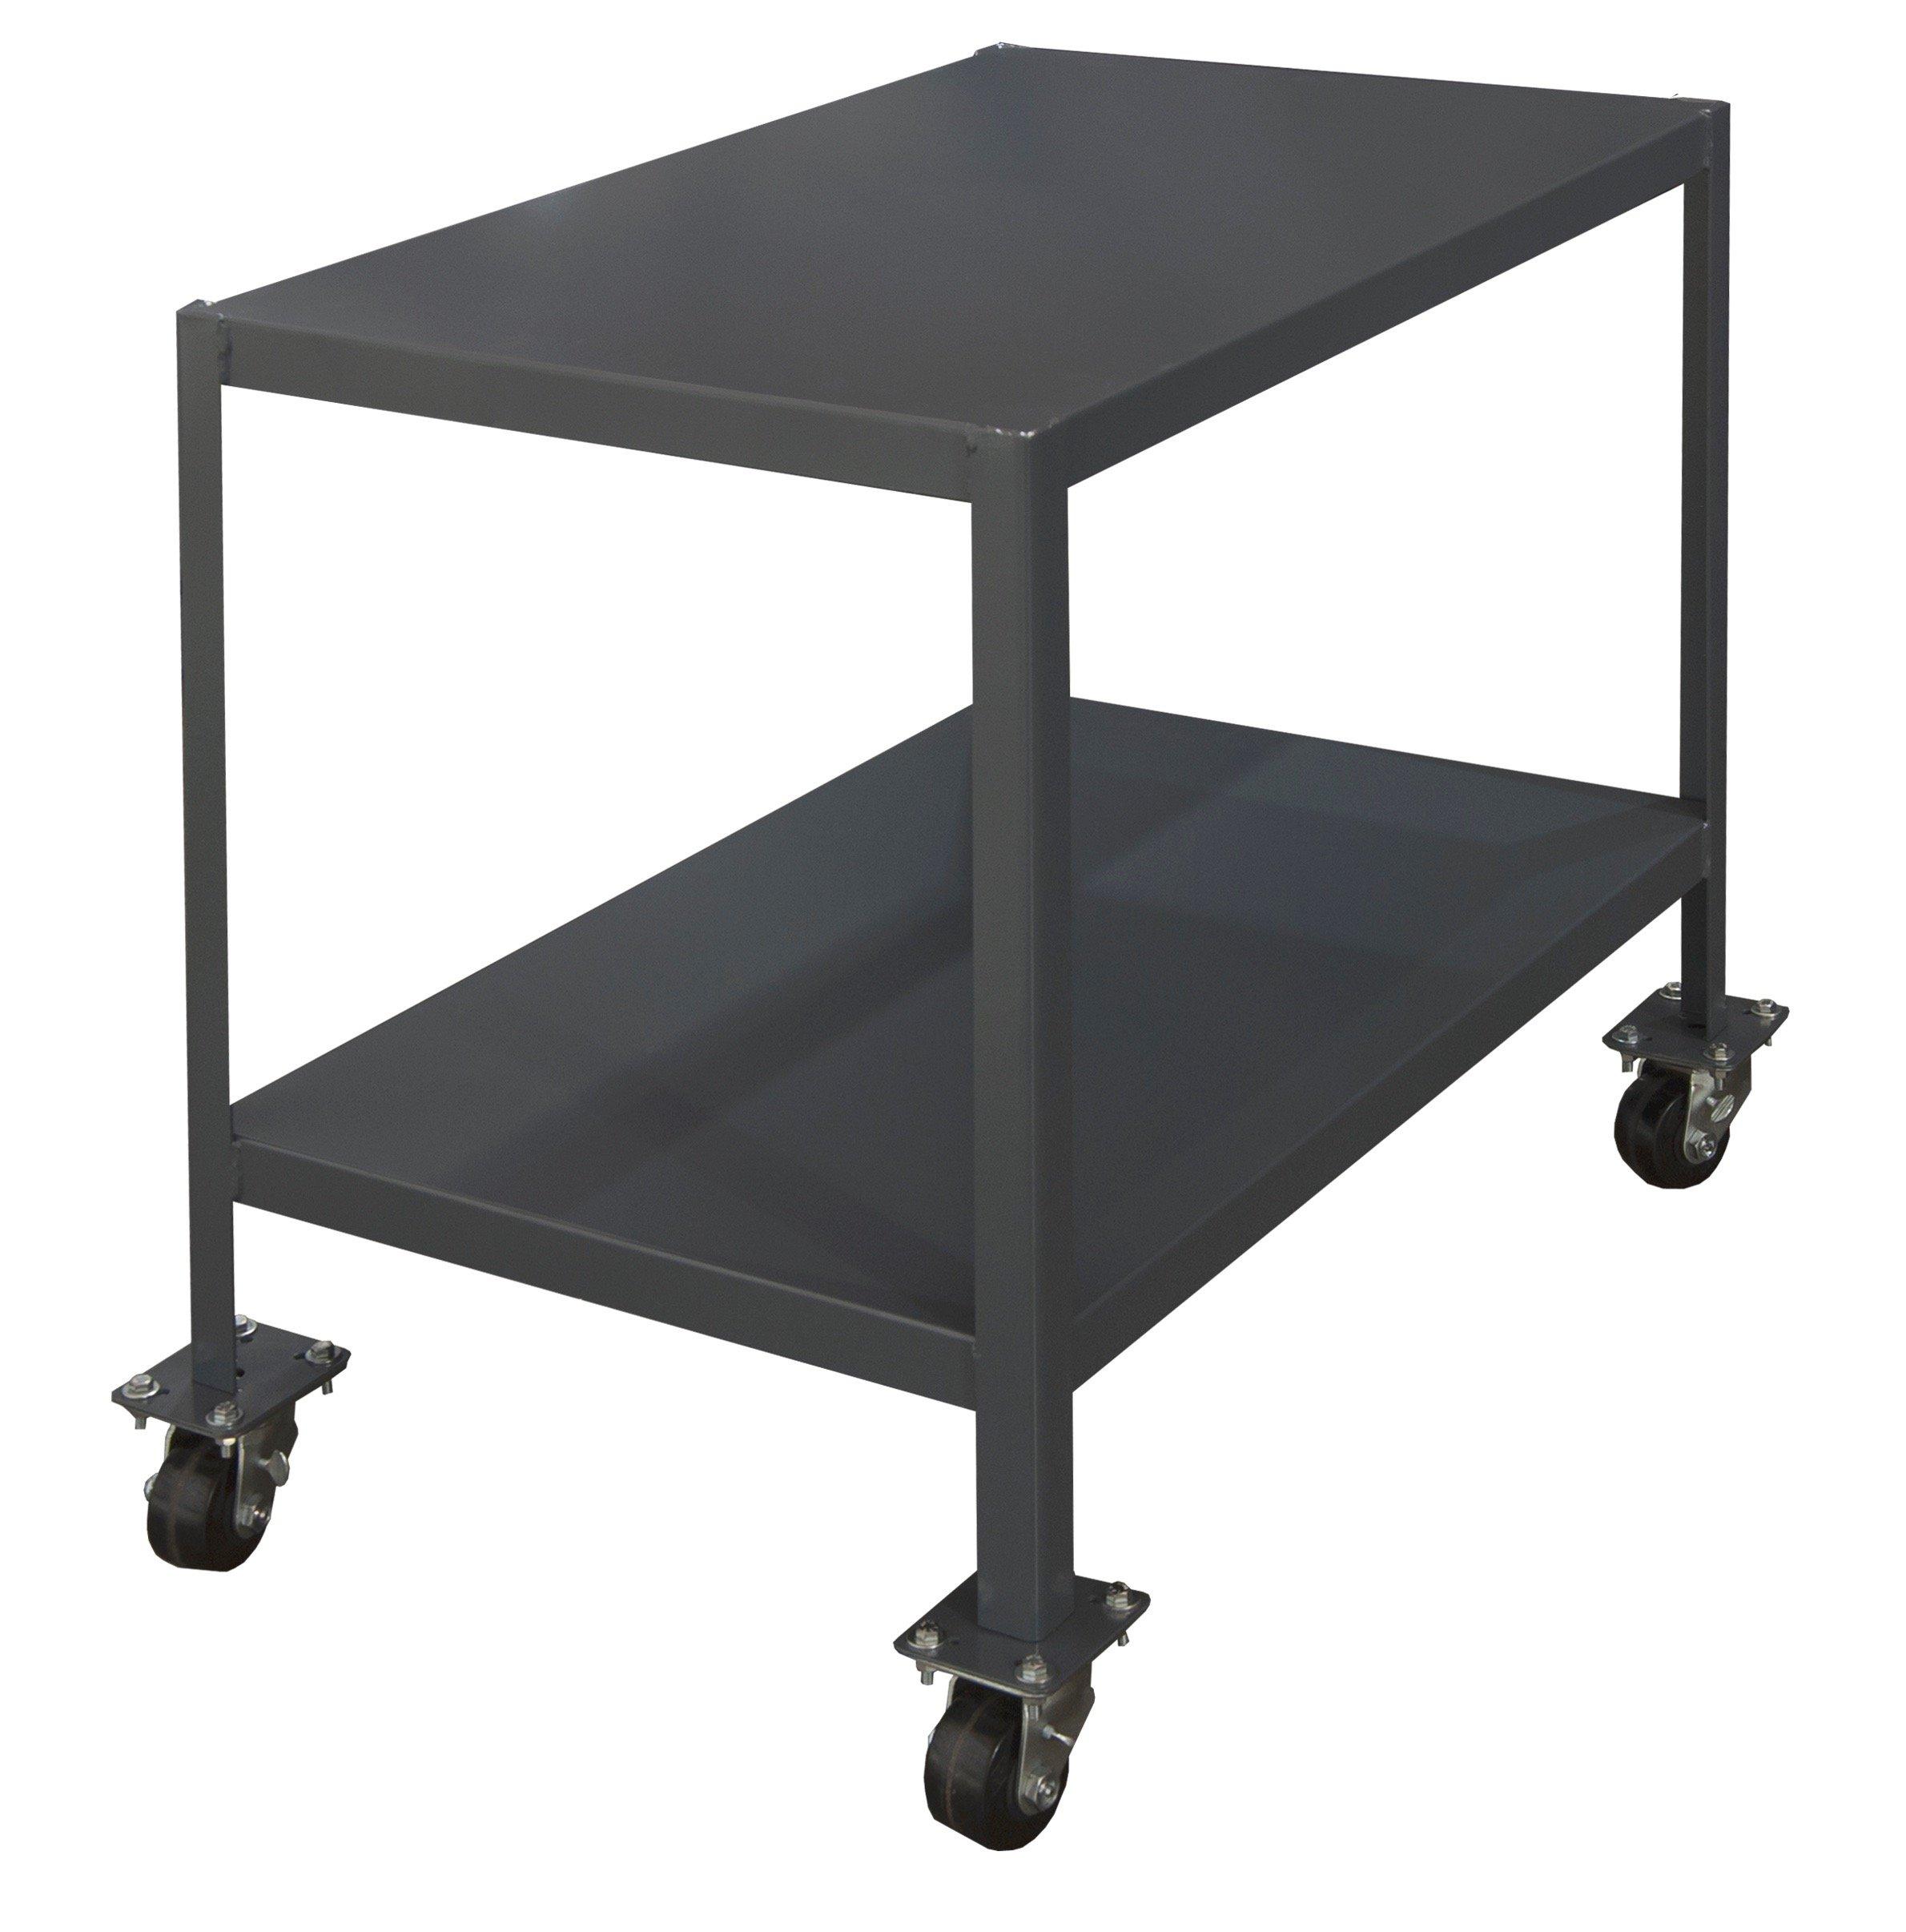 Durham Steel Mobile Medium Duty Machine Table, MTM243630-2K295, 2 Shelves, 2000 lbs Capacity, 36'' Length x 24'' Width x 30'' Height